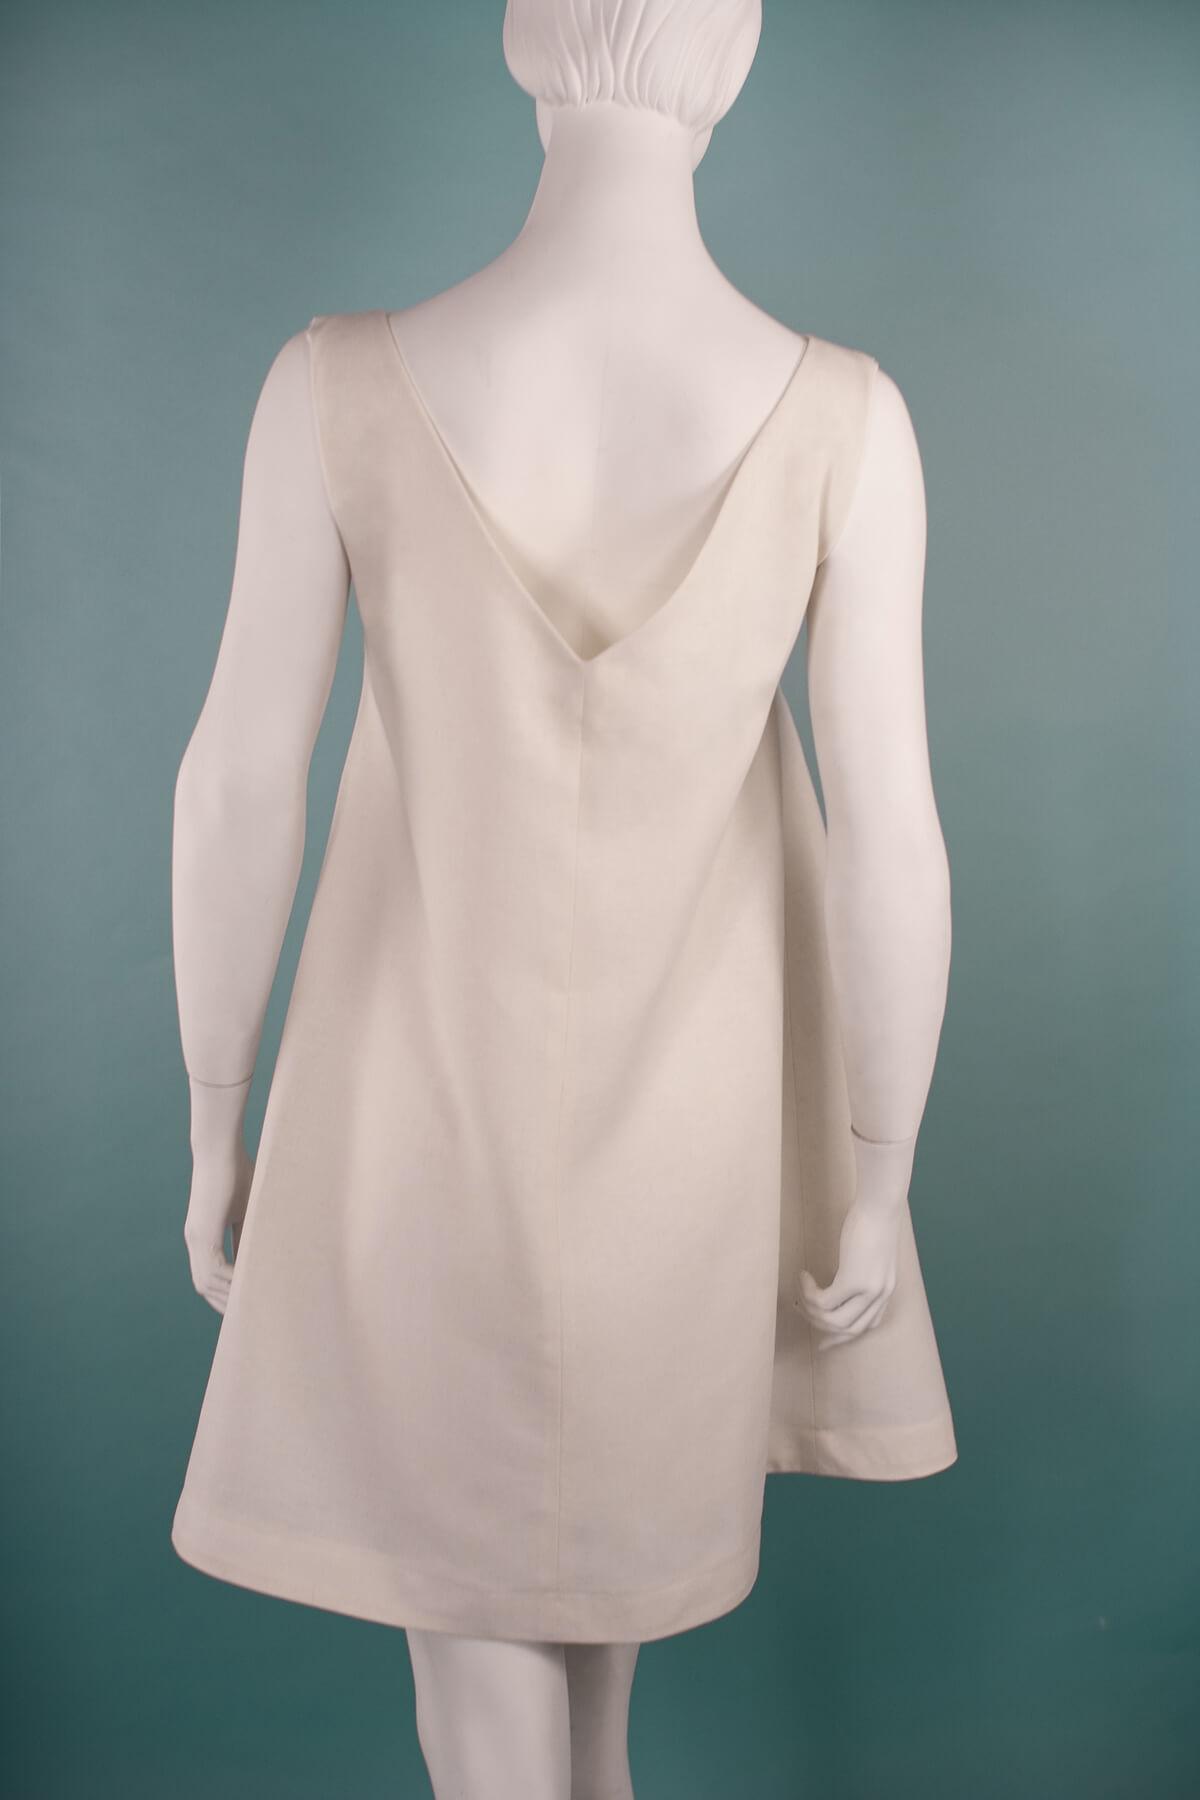 A-line-dress-sewing-pattern-back